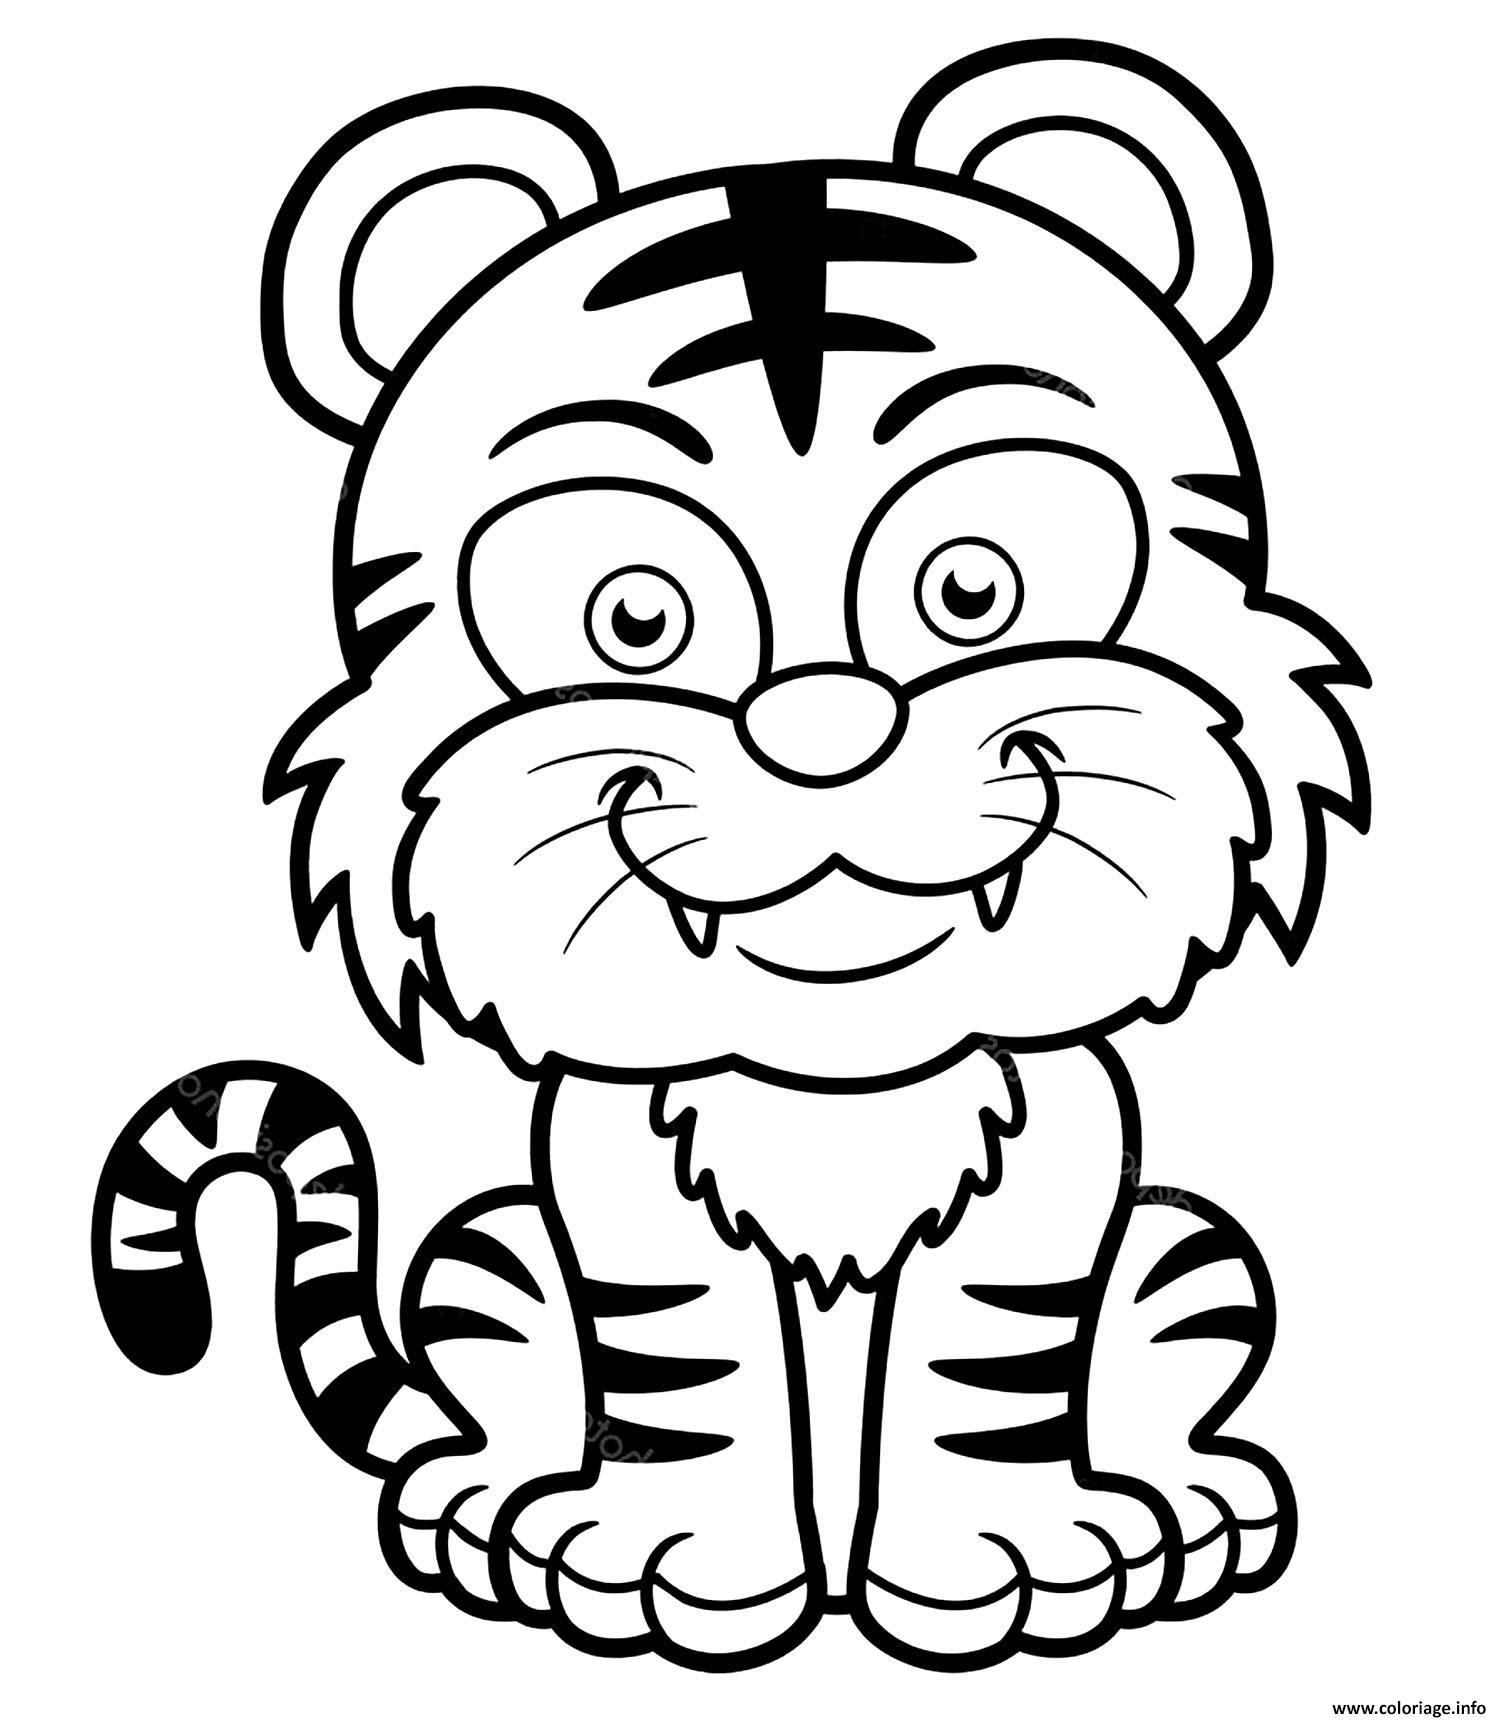 Coloriage Tigre Enfants Facile Maternelle Dessin Tigre A Imprimer